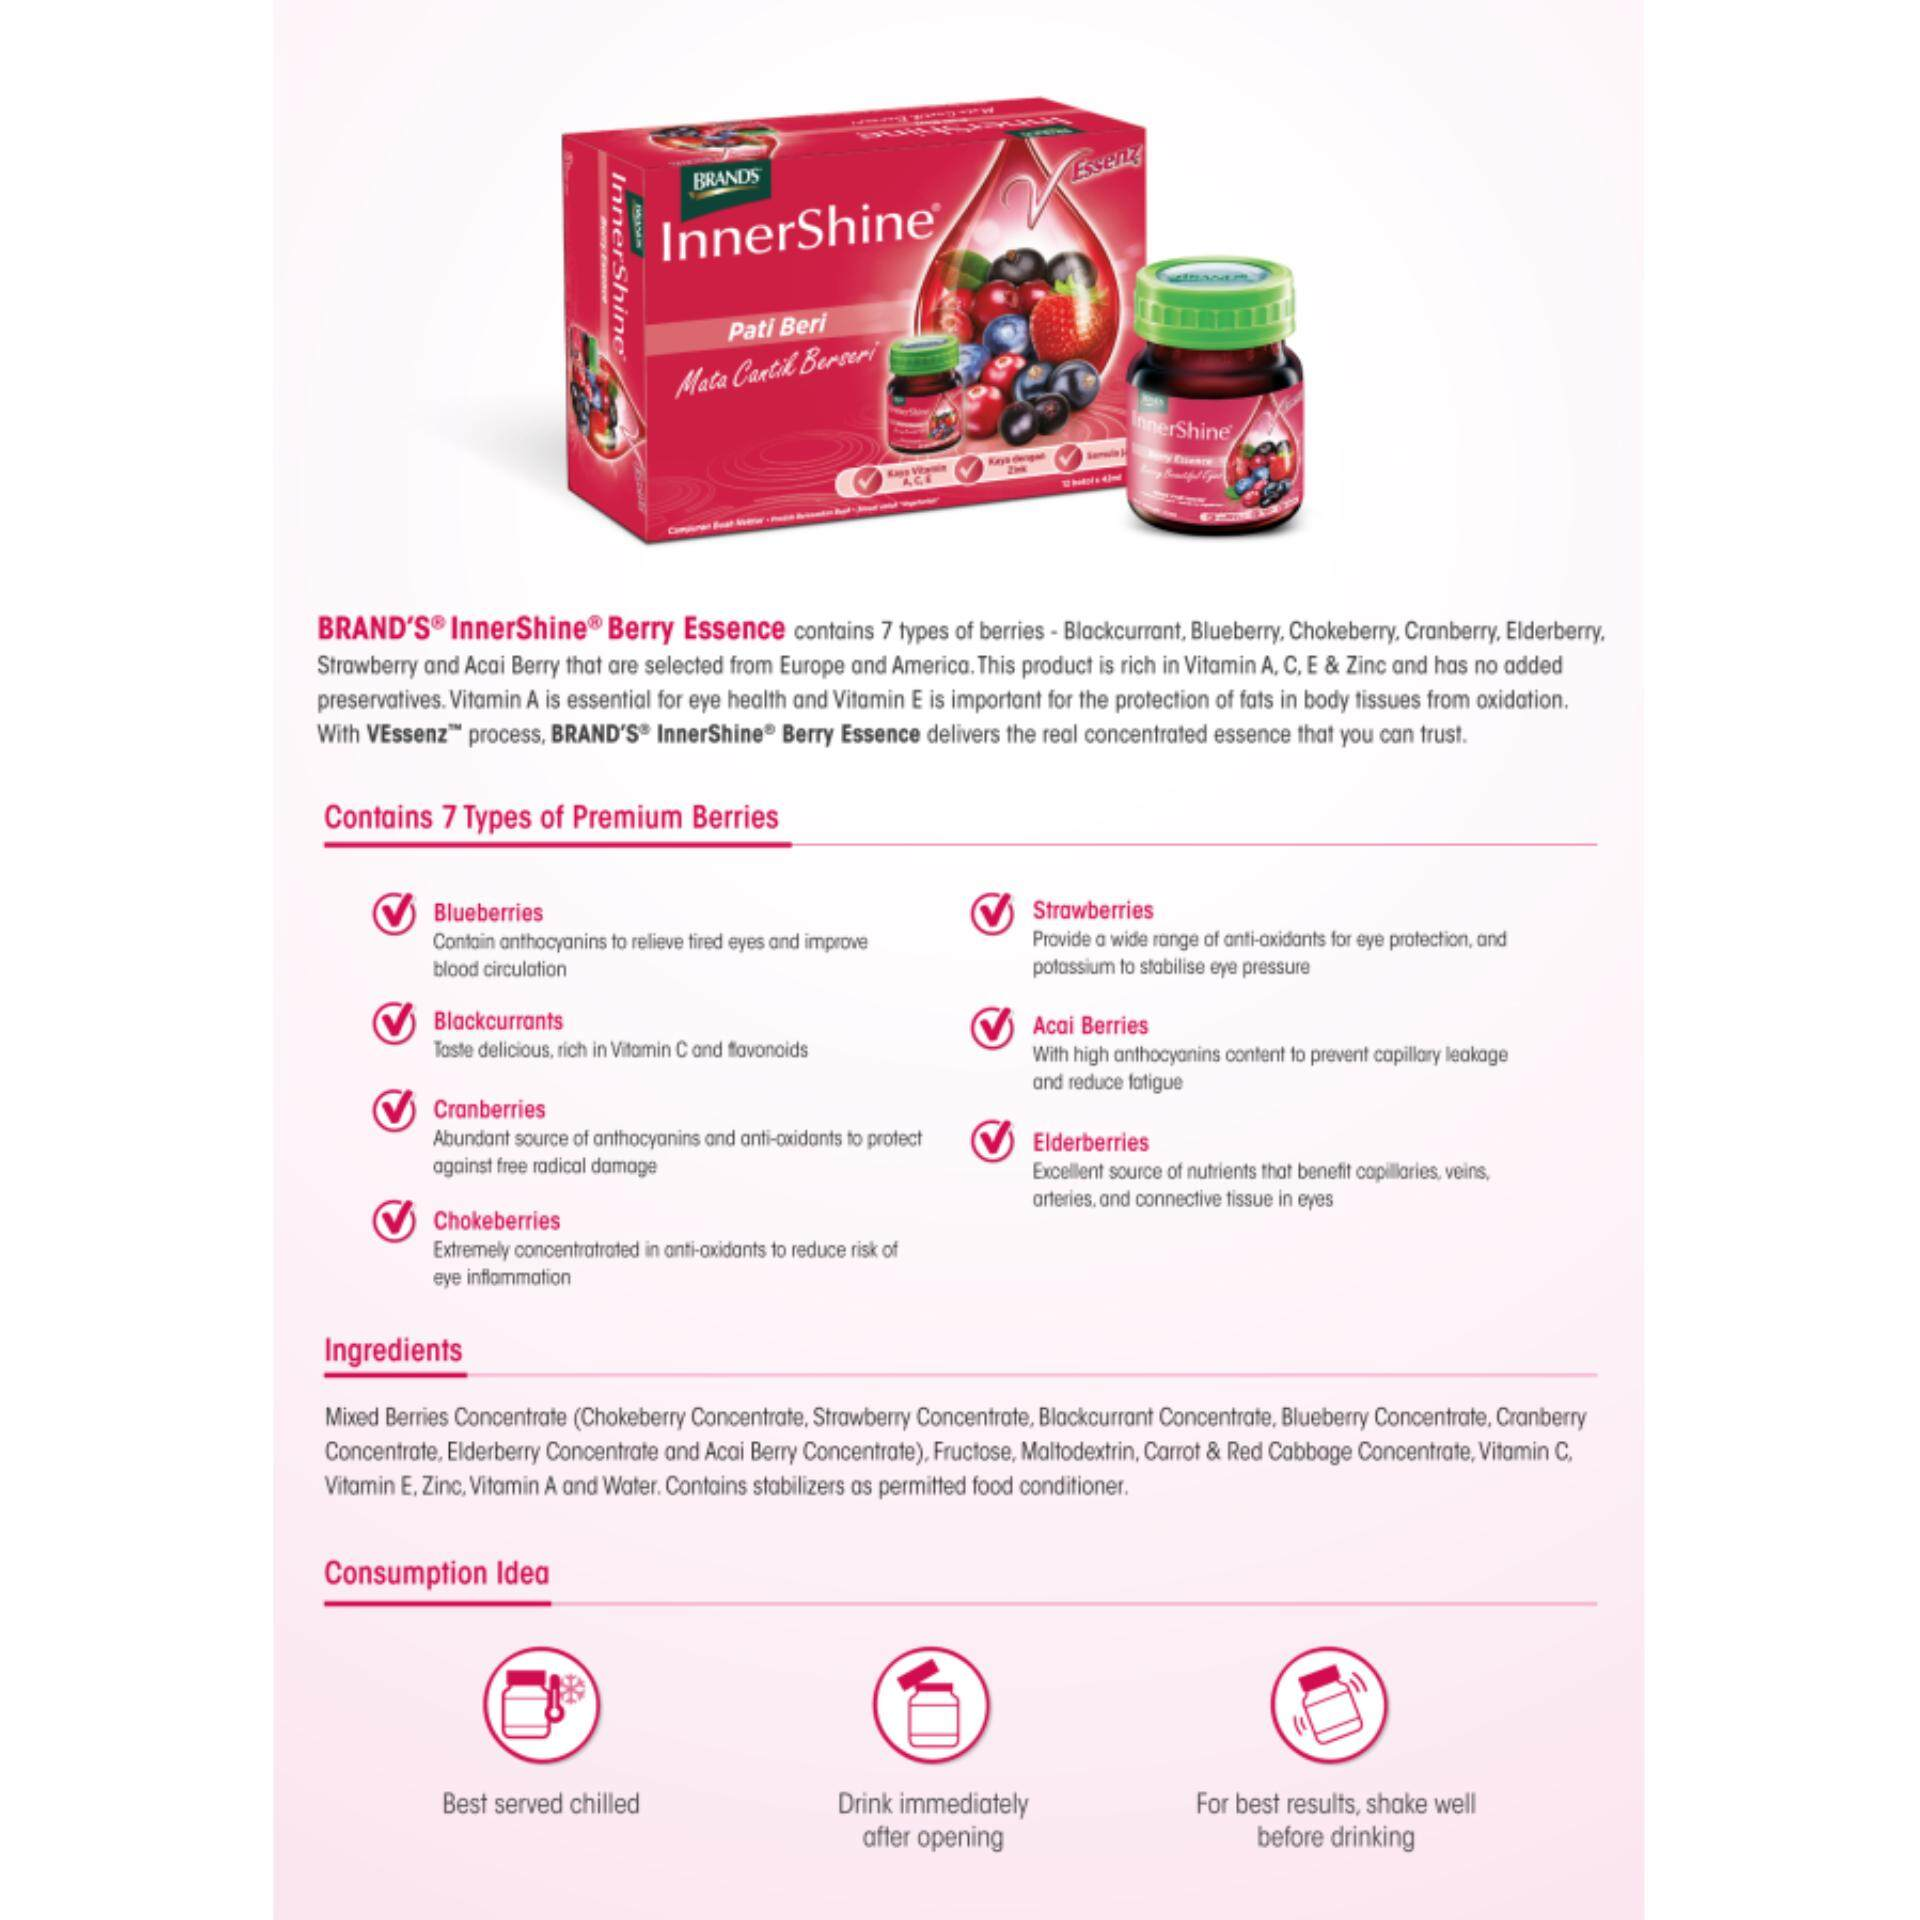 BRAND'S InnerShine Prune Essence (1x12's) + InnerShine Berry Essence (1x12's) - 24 bottles x 42ml